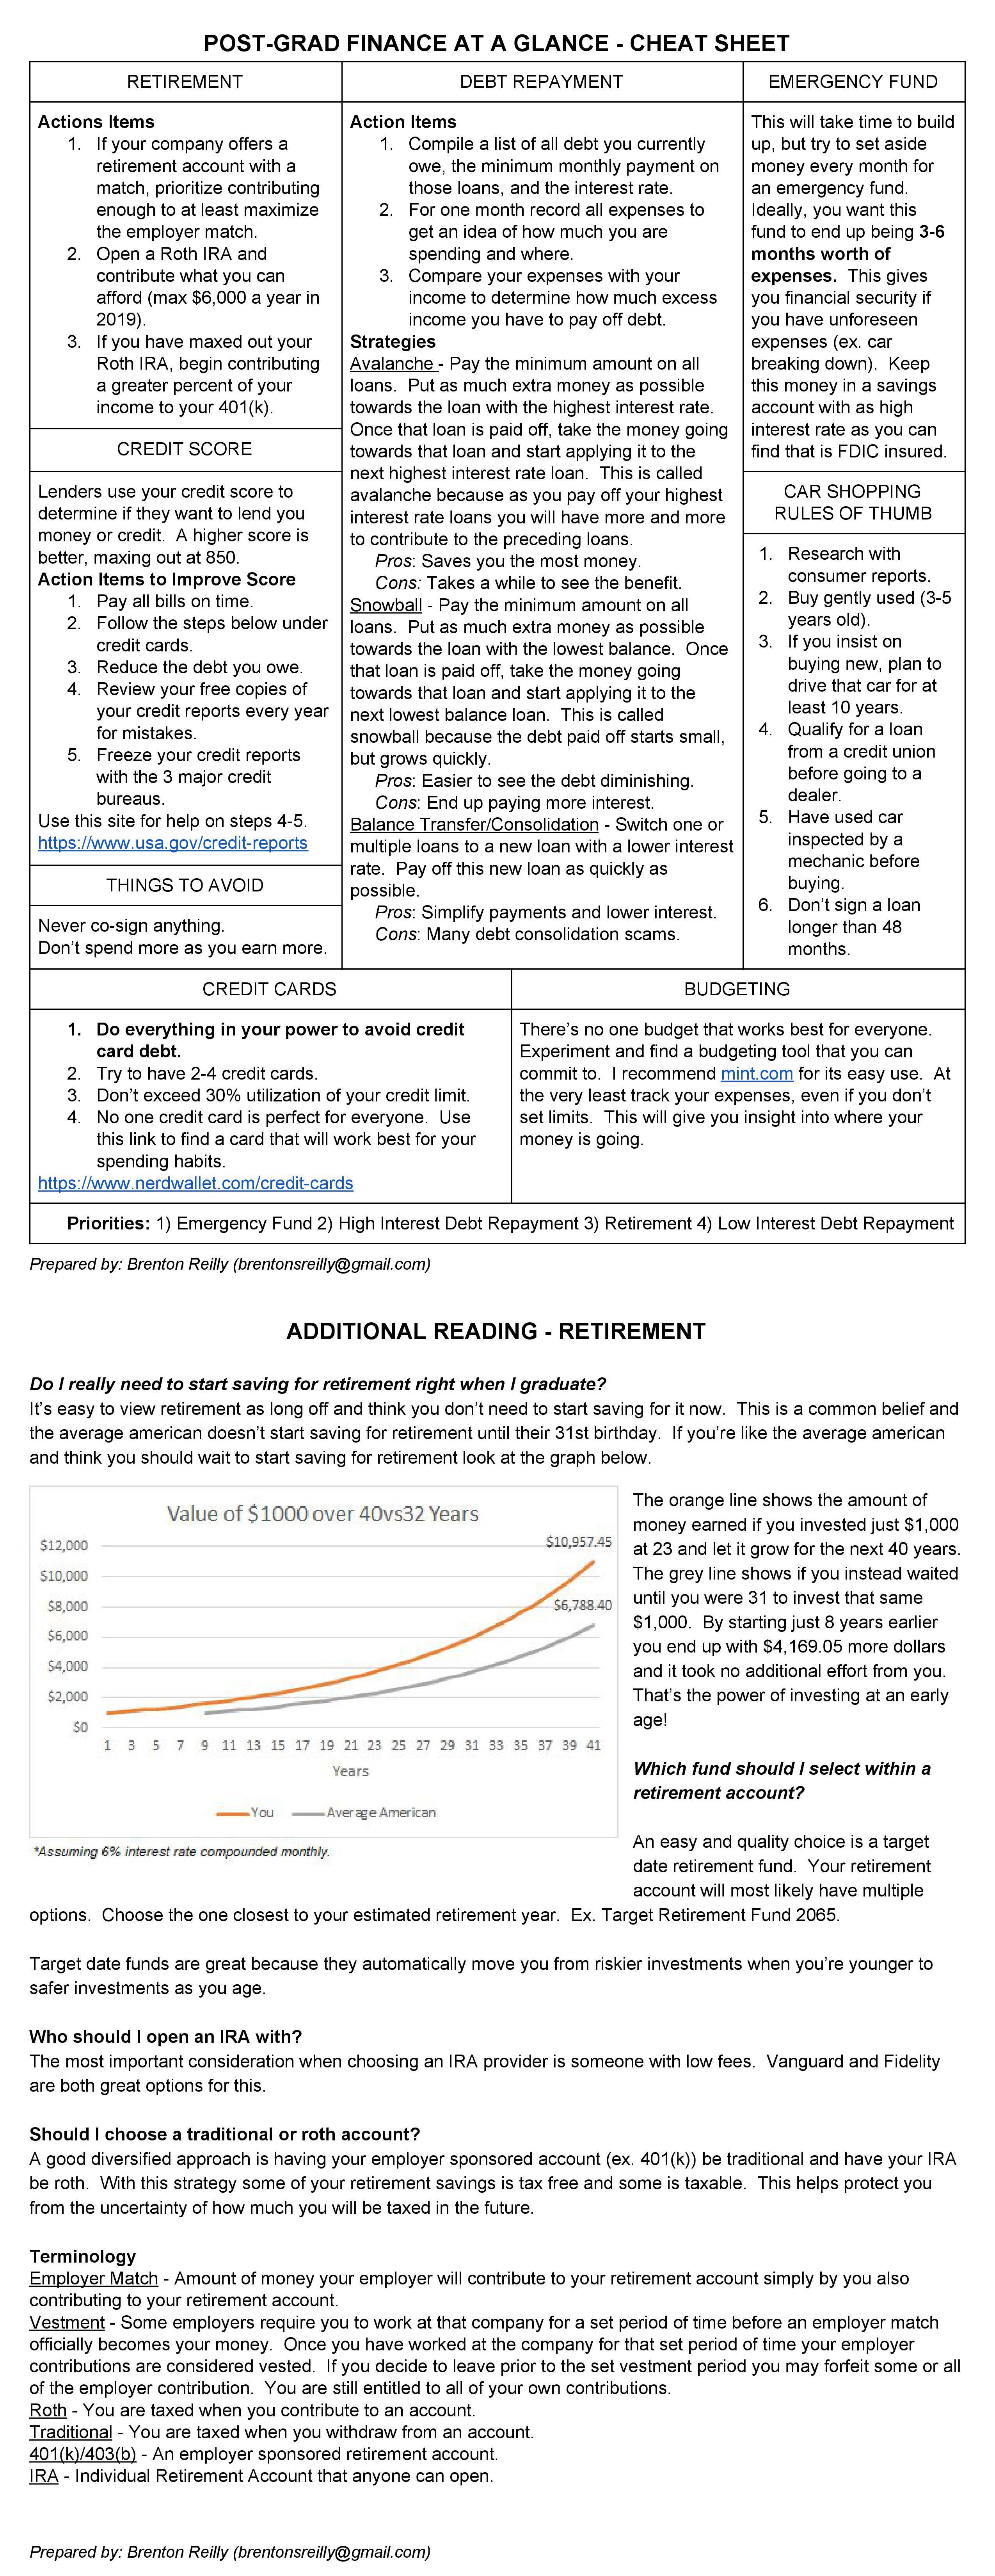 post-grad-finance-cheat-sheet